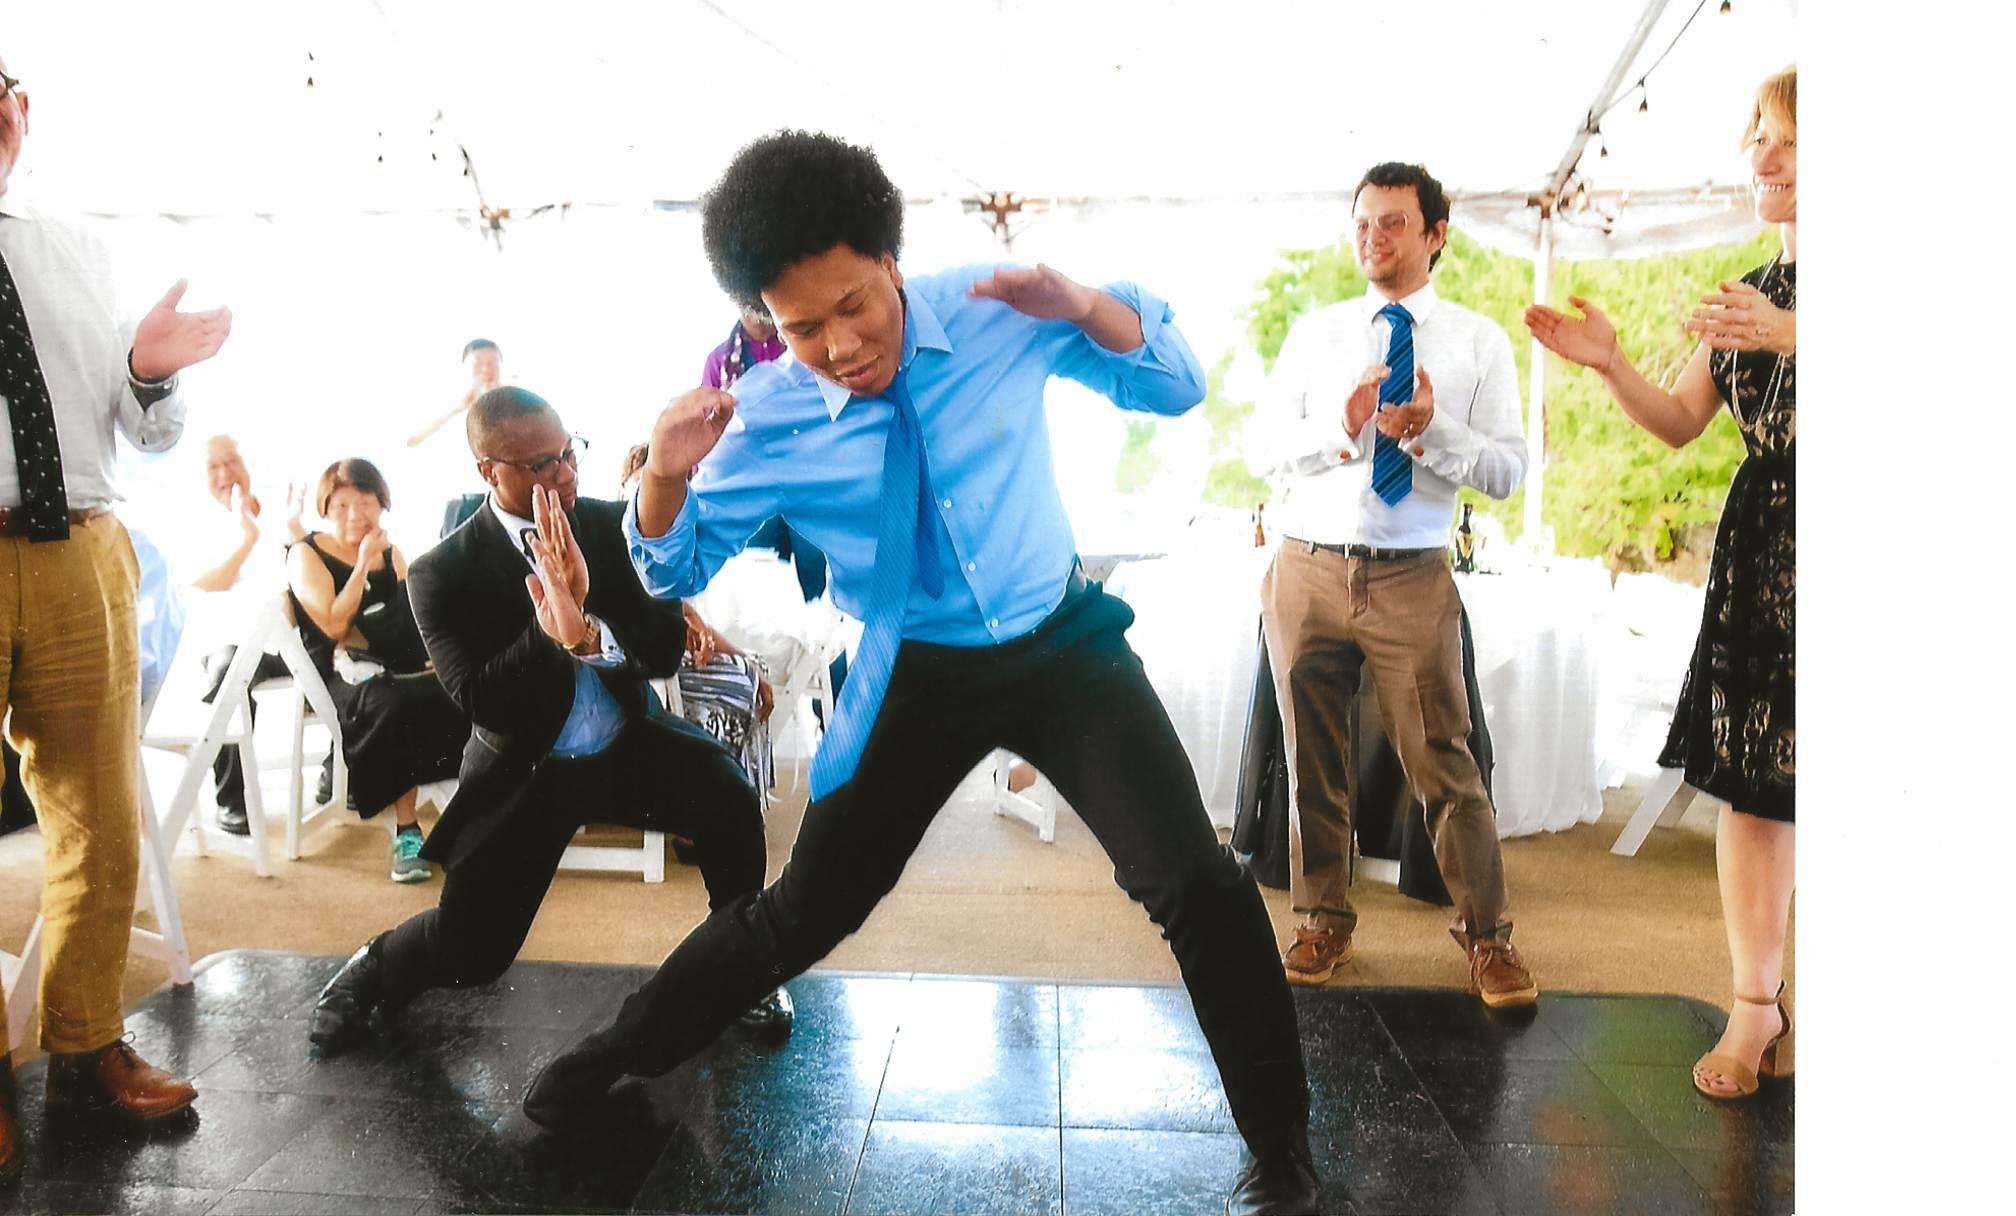 117-dorian-takes-center-stage-ali-wedding-2018-page-001.jpg